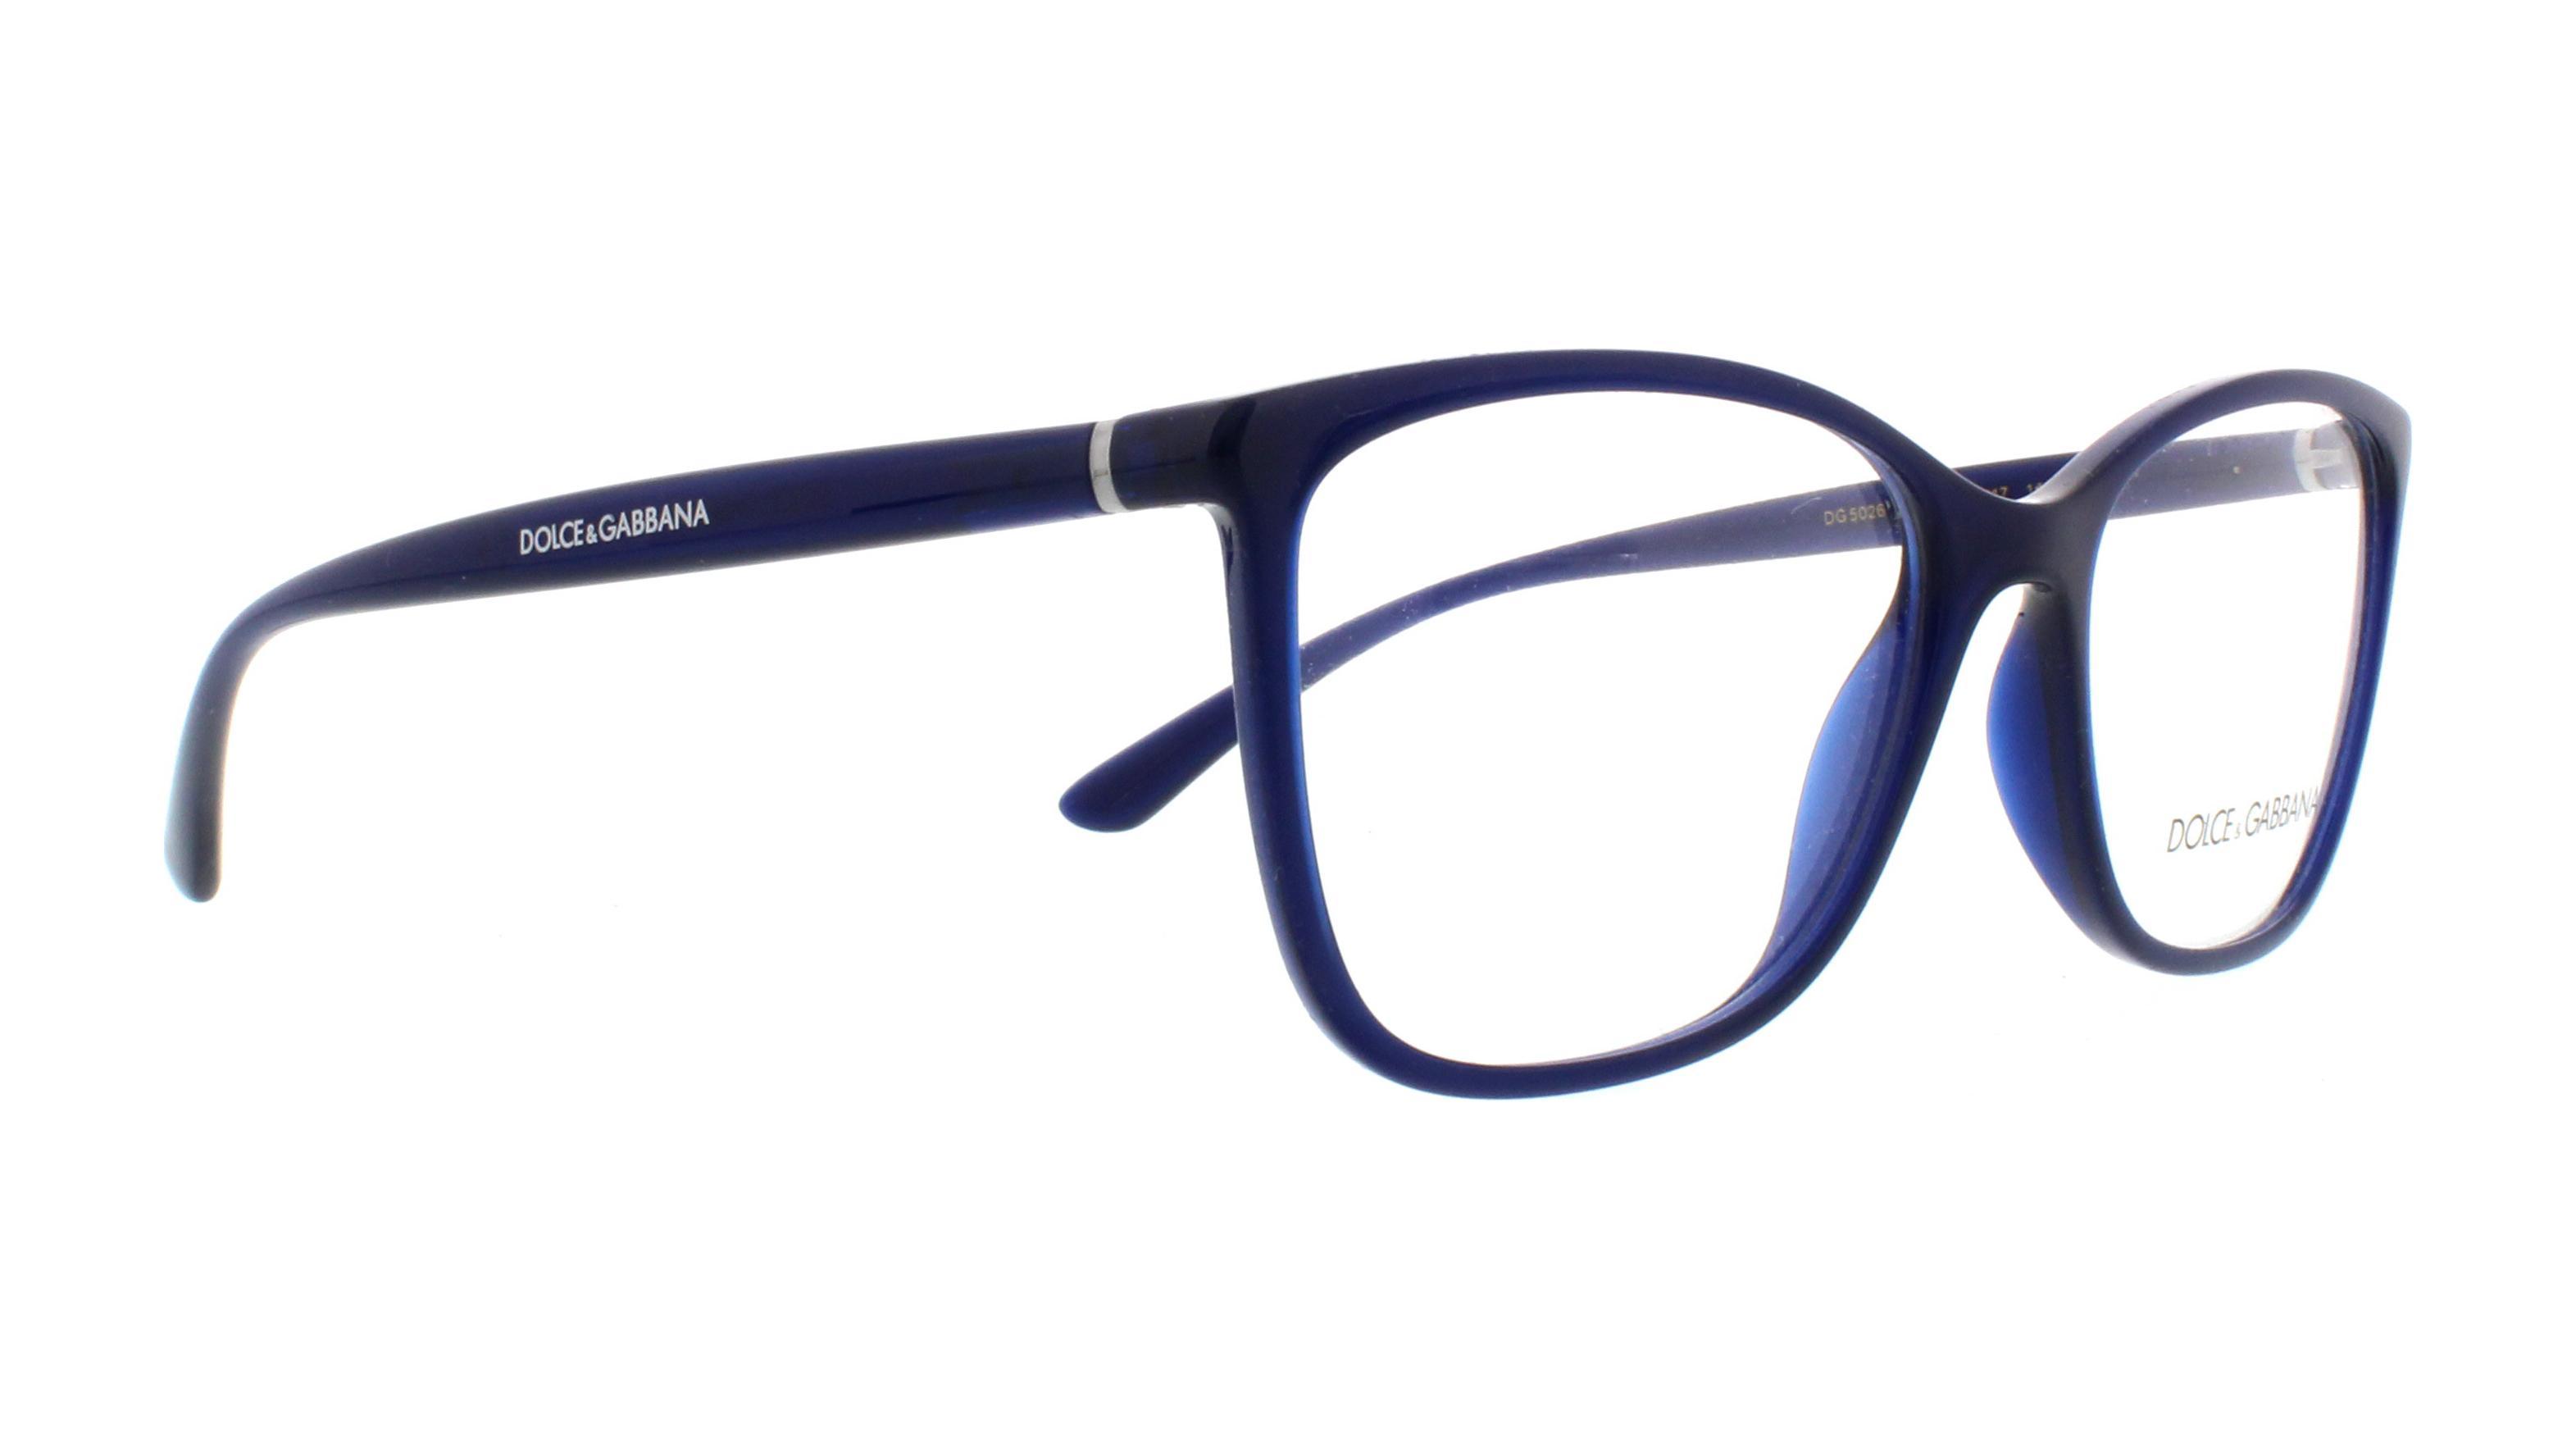 e4817cb28cf DOLCE   GABBANA Eyeglasses DG5026 3094 Opal Blue 54MM 8053672822168 ...